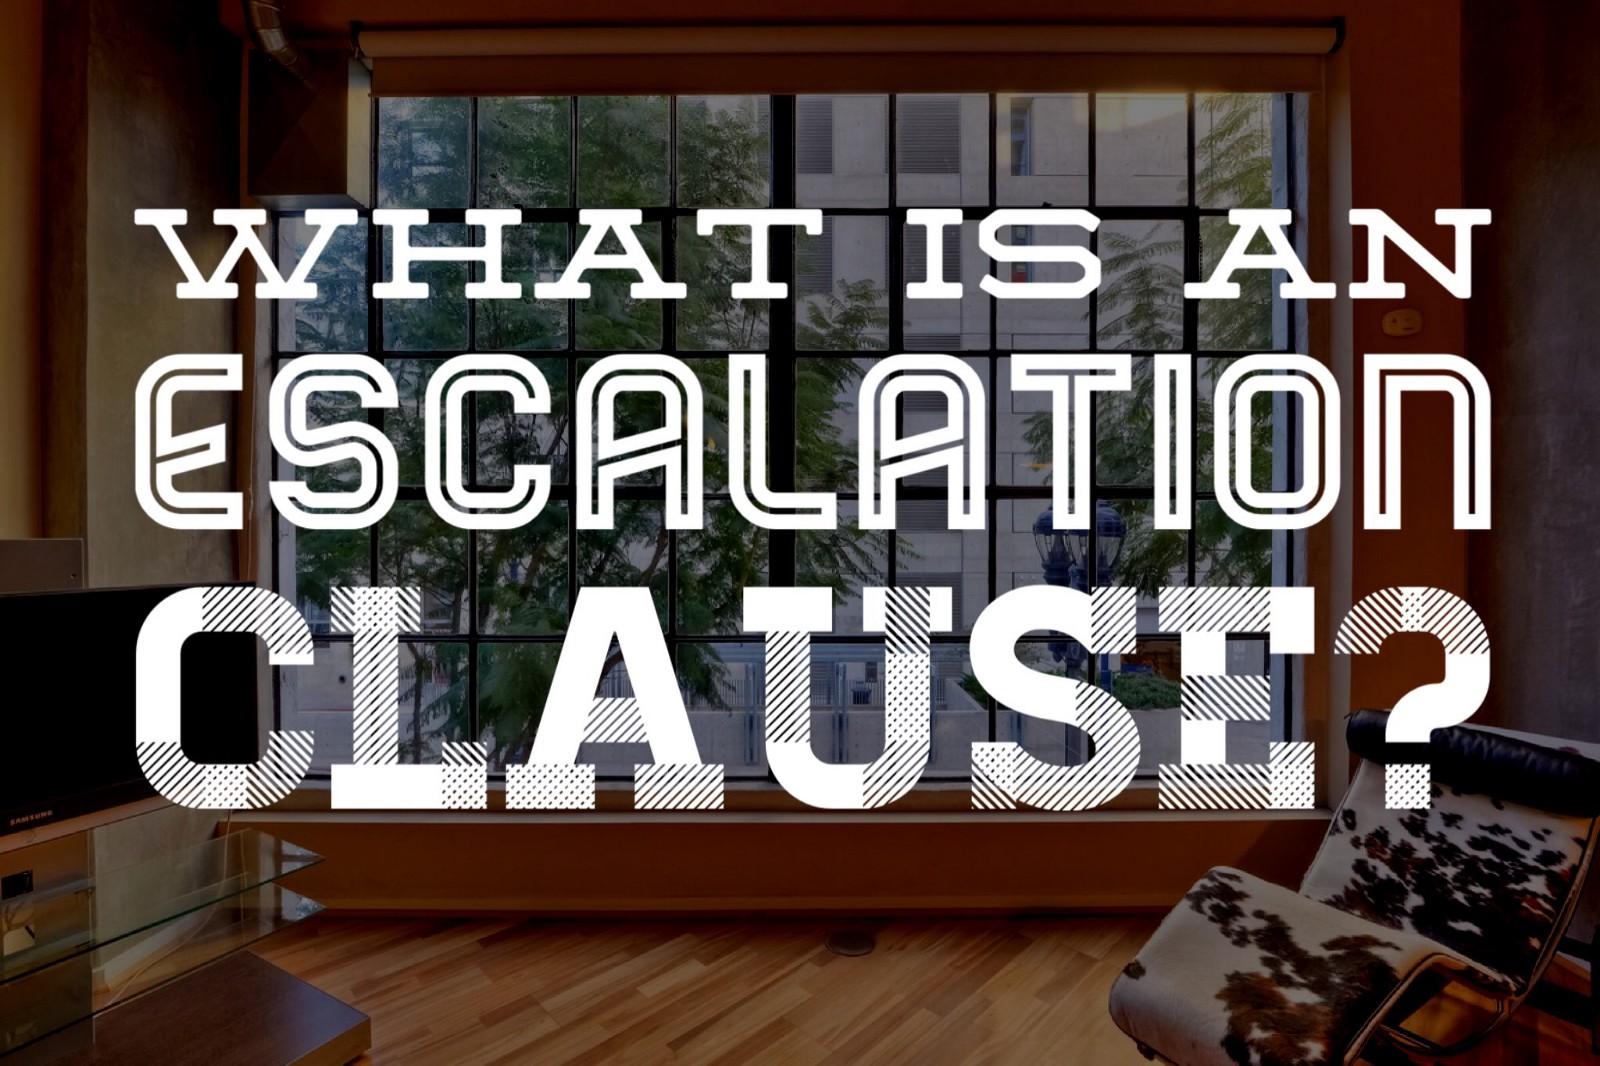 escalation clause.jpeg